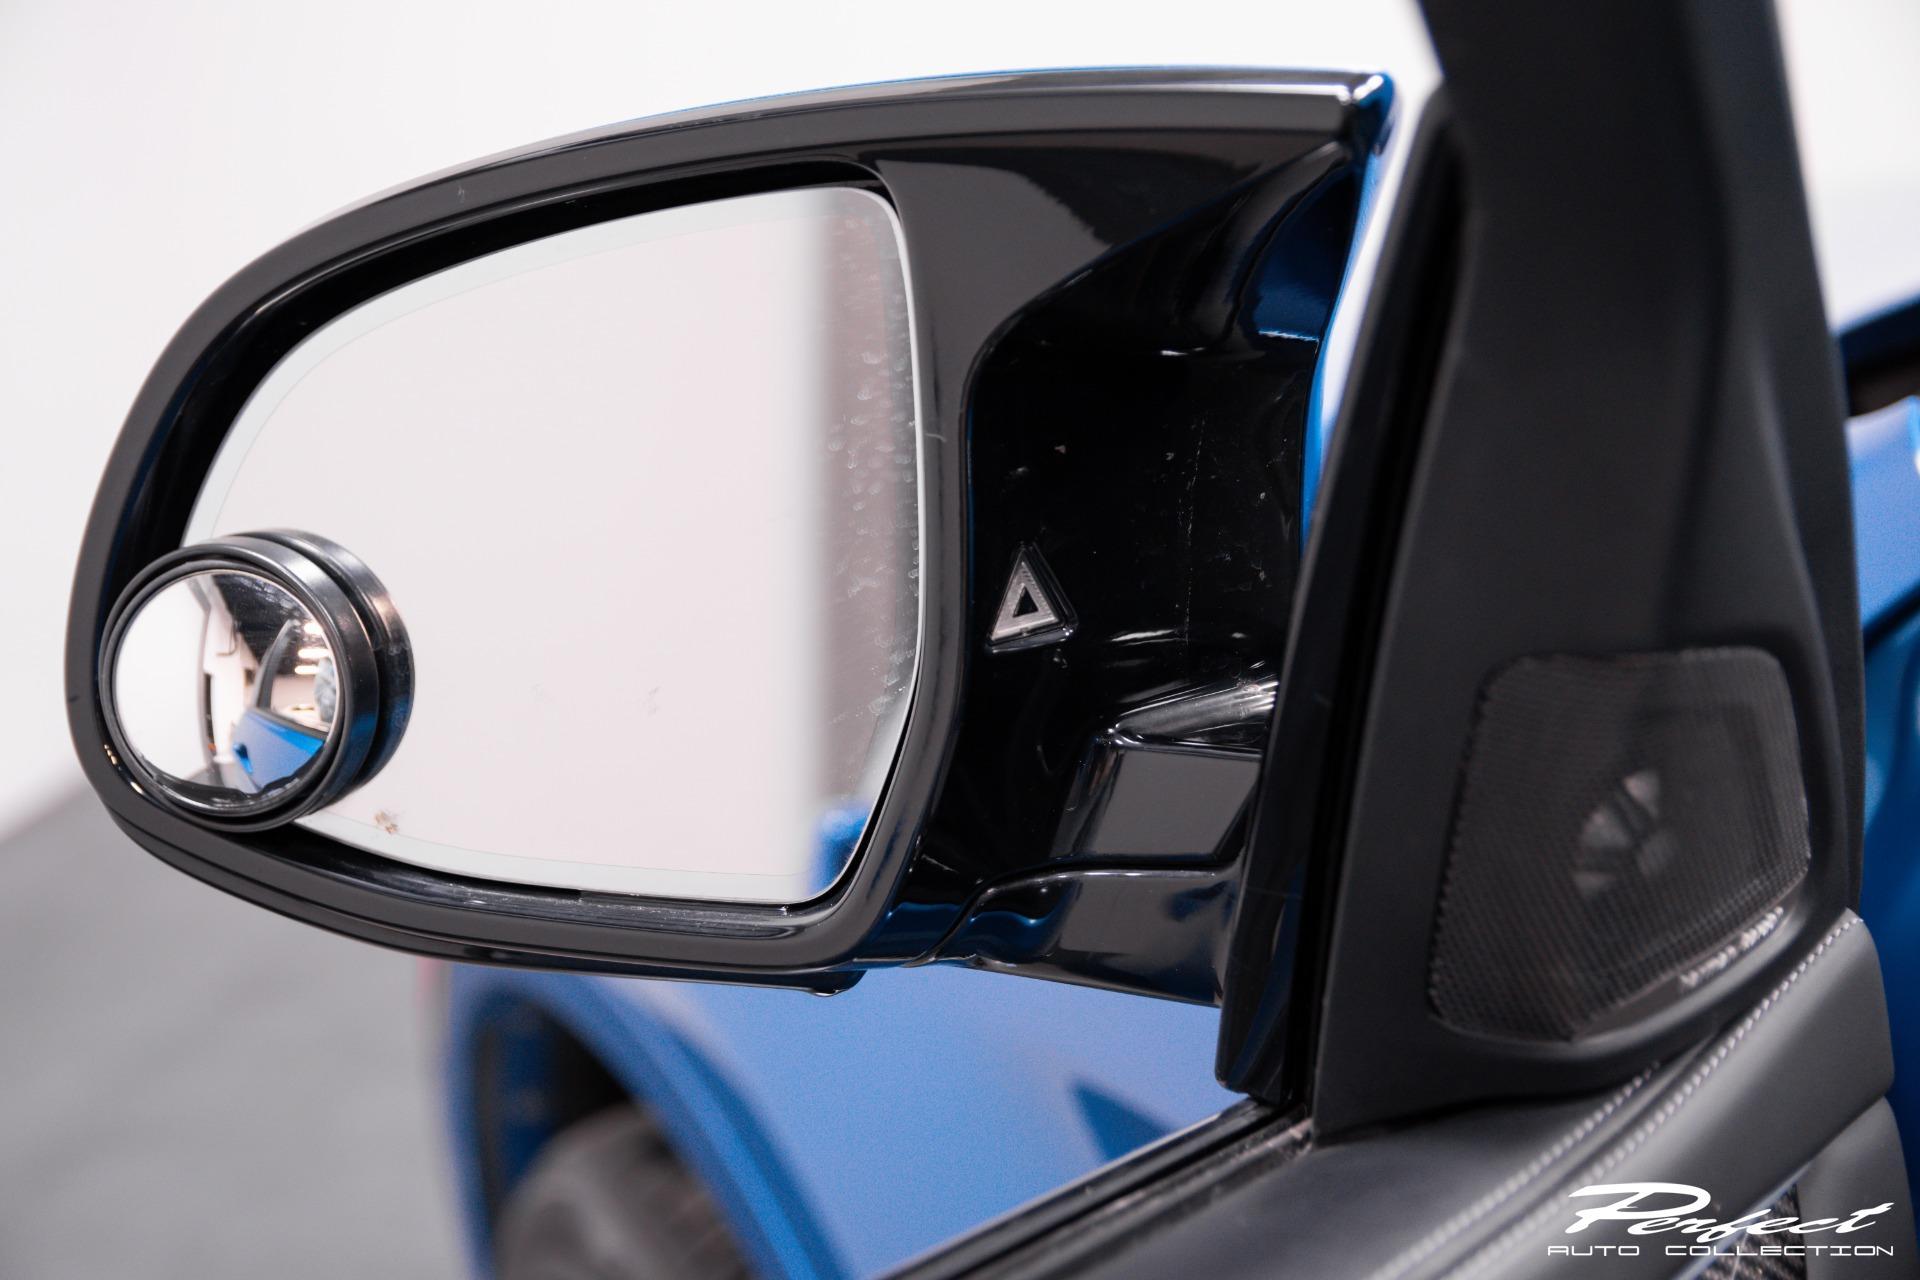 Used 2015 BMW X6 M